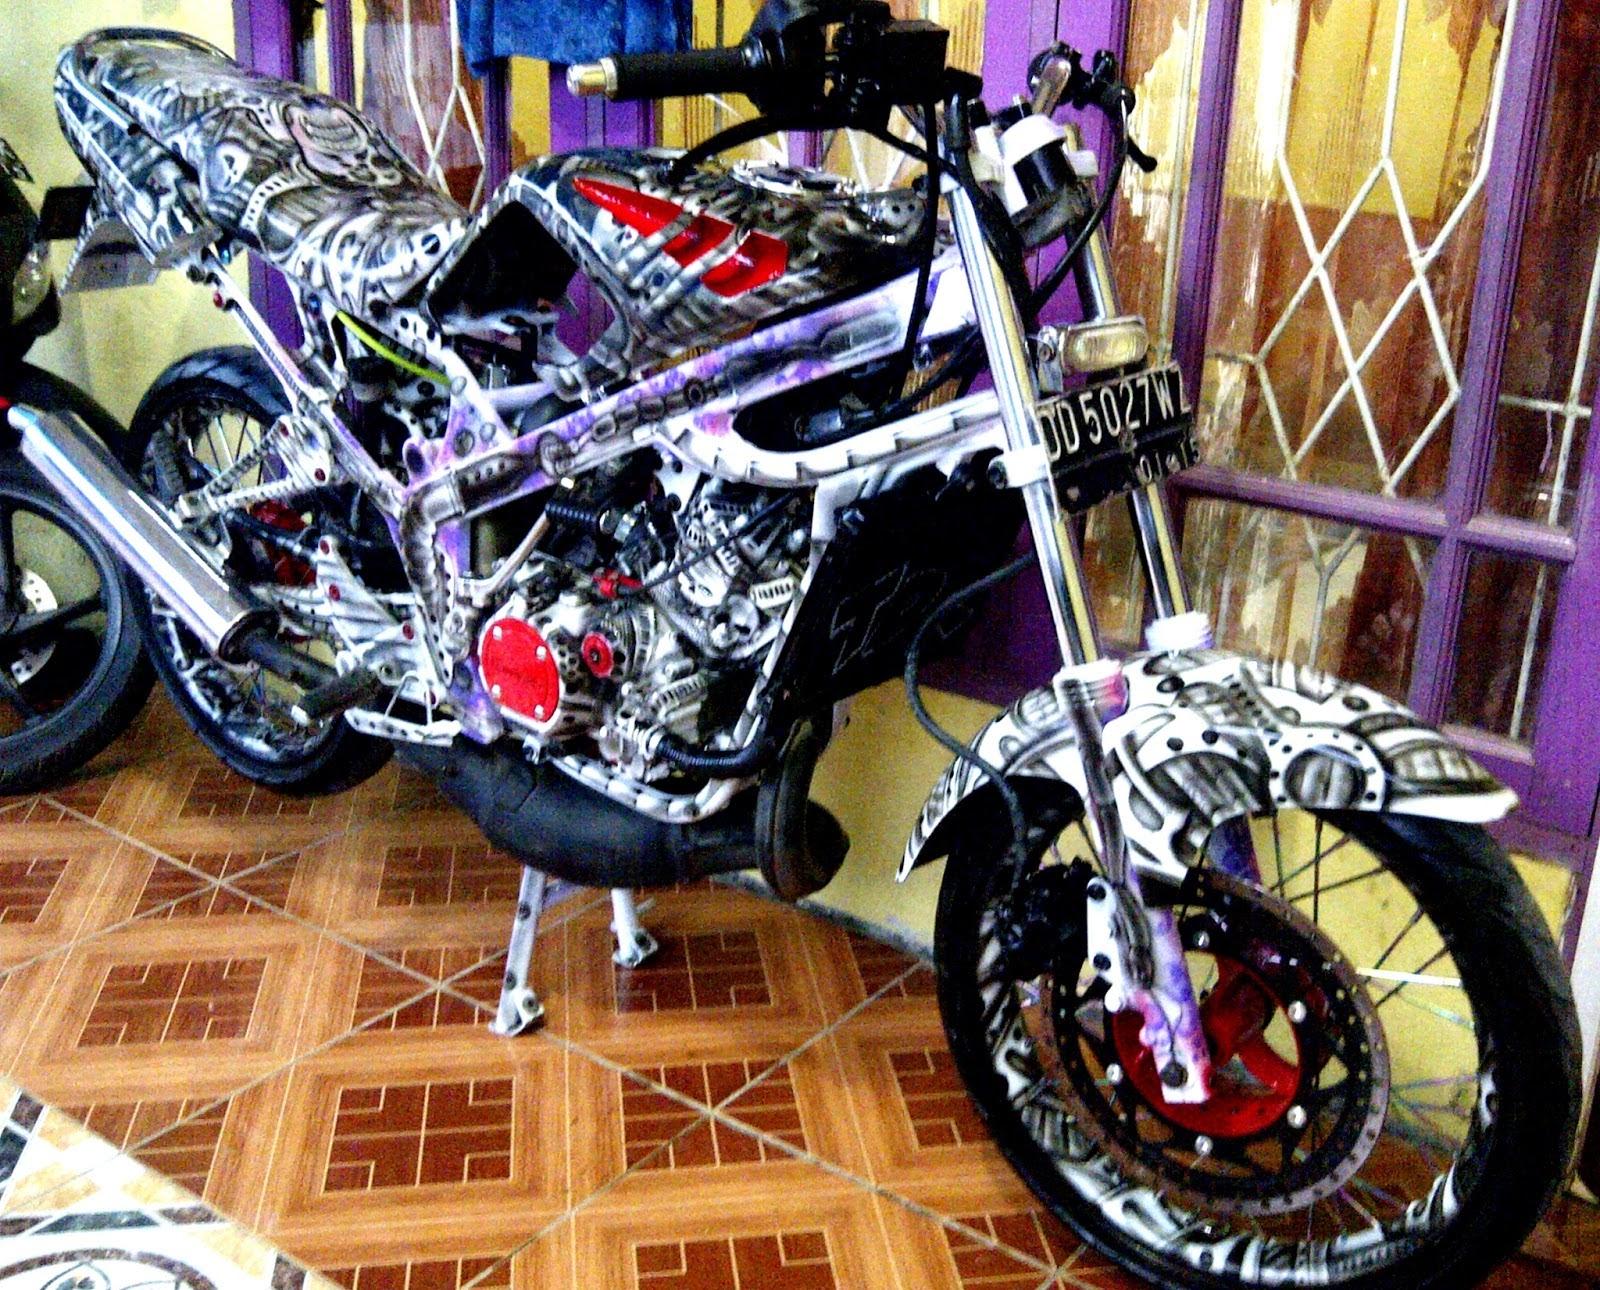 Modifikasi Ninja Kawasaki 150 R Yang Menakjubkn